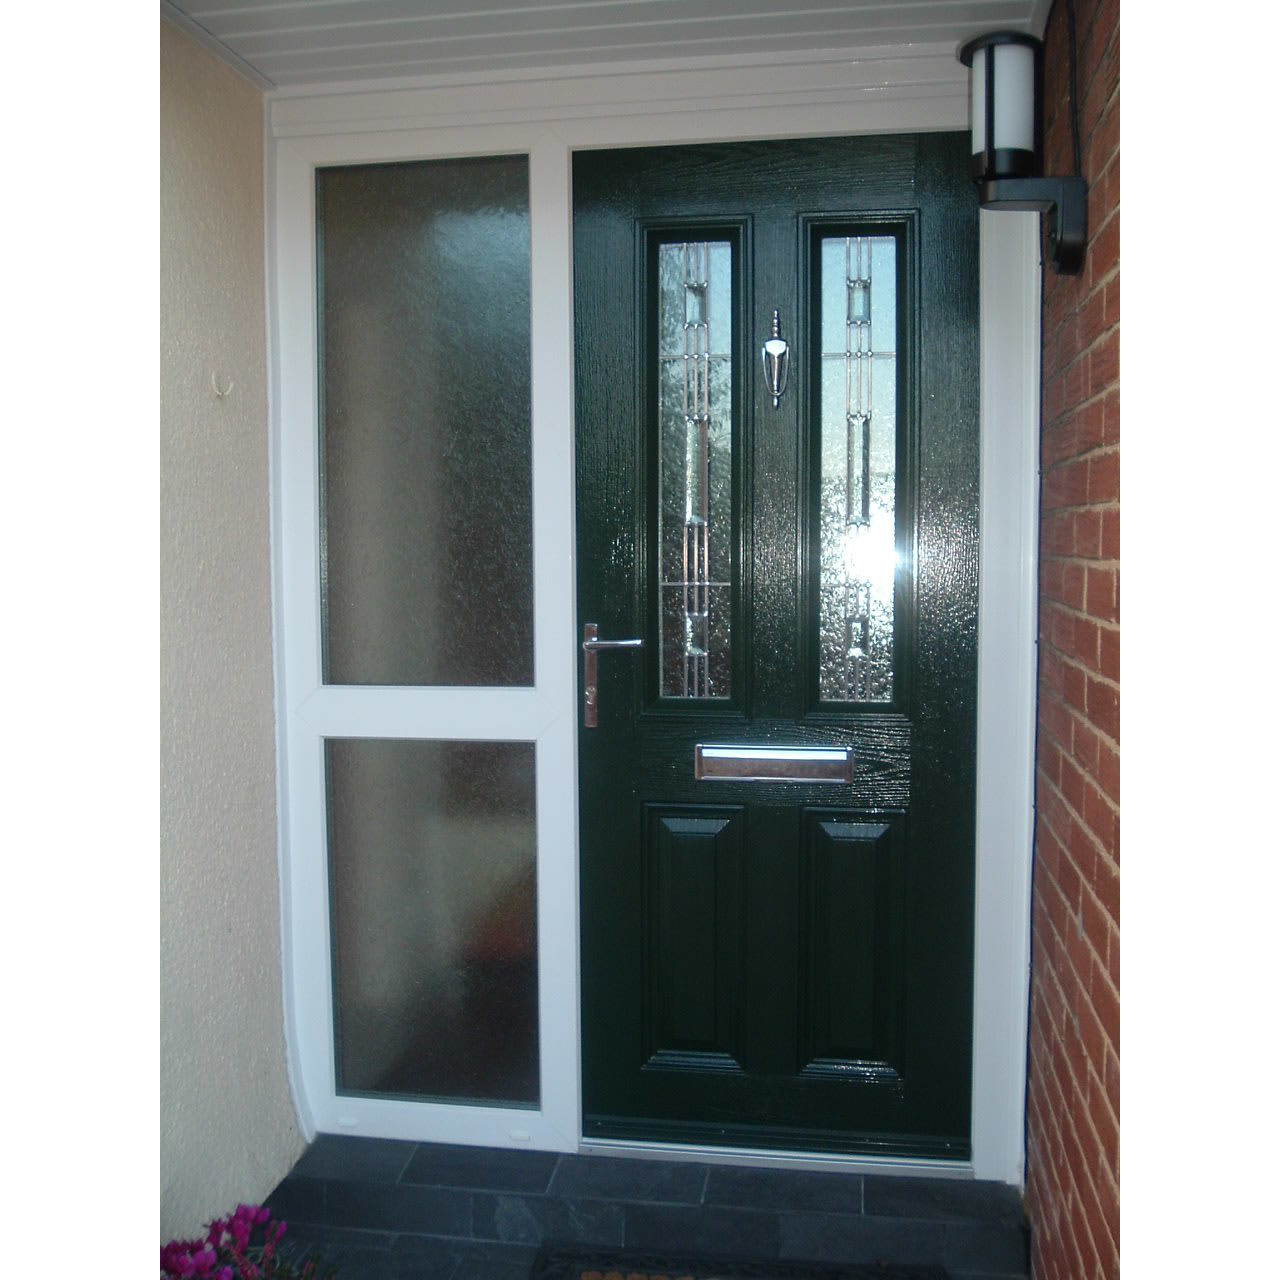 J.E.D Double Glazing Repairs - Durham, Durham DH1 5LN - 01913 844903 | ShowMeLocal.com